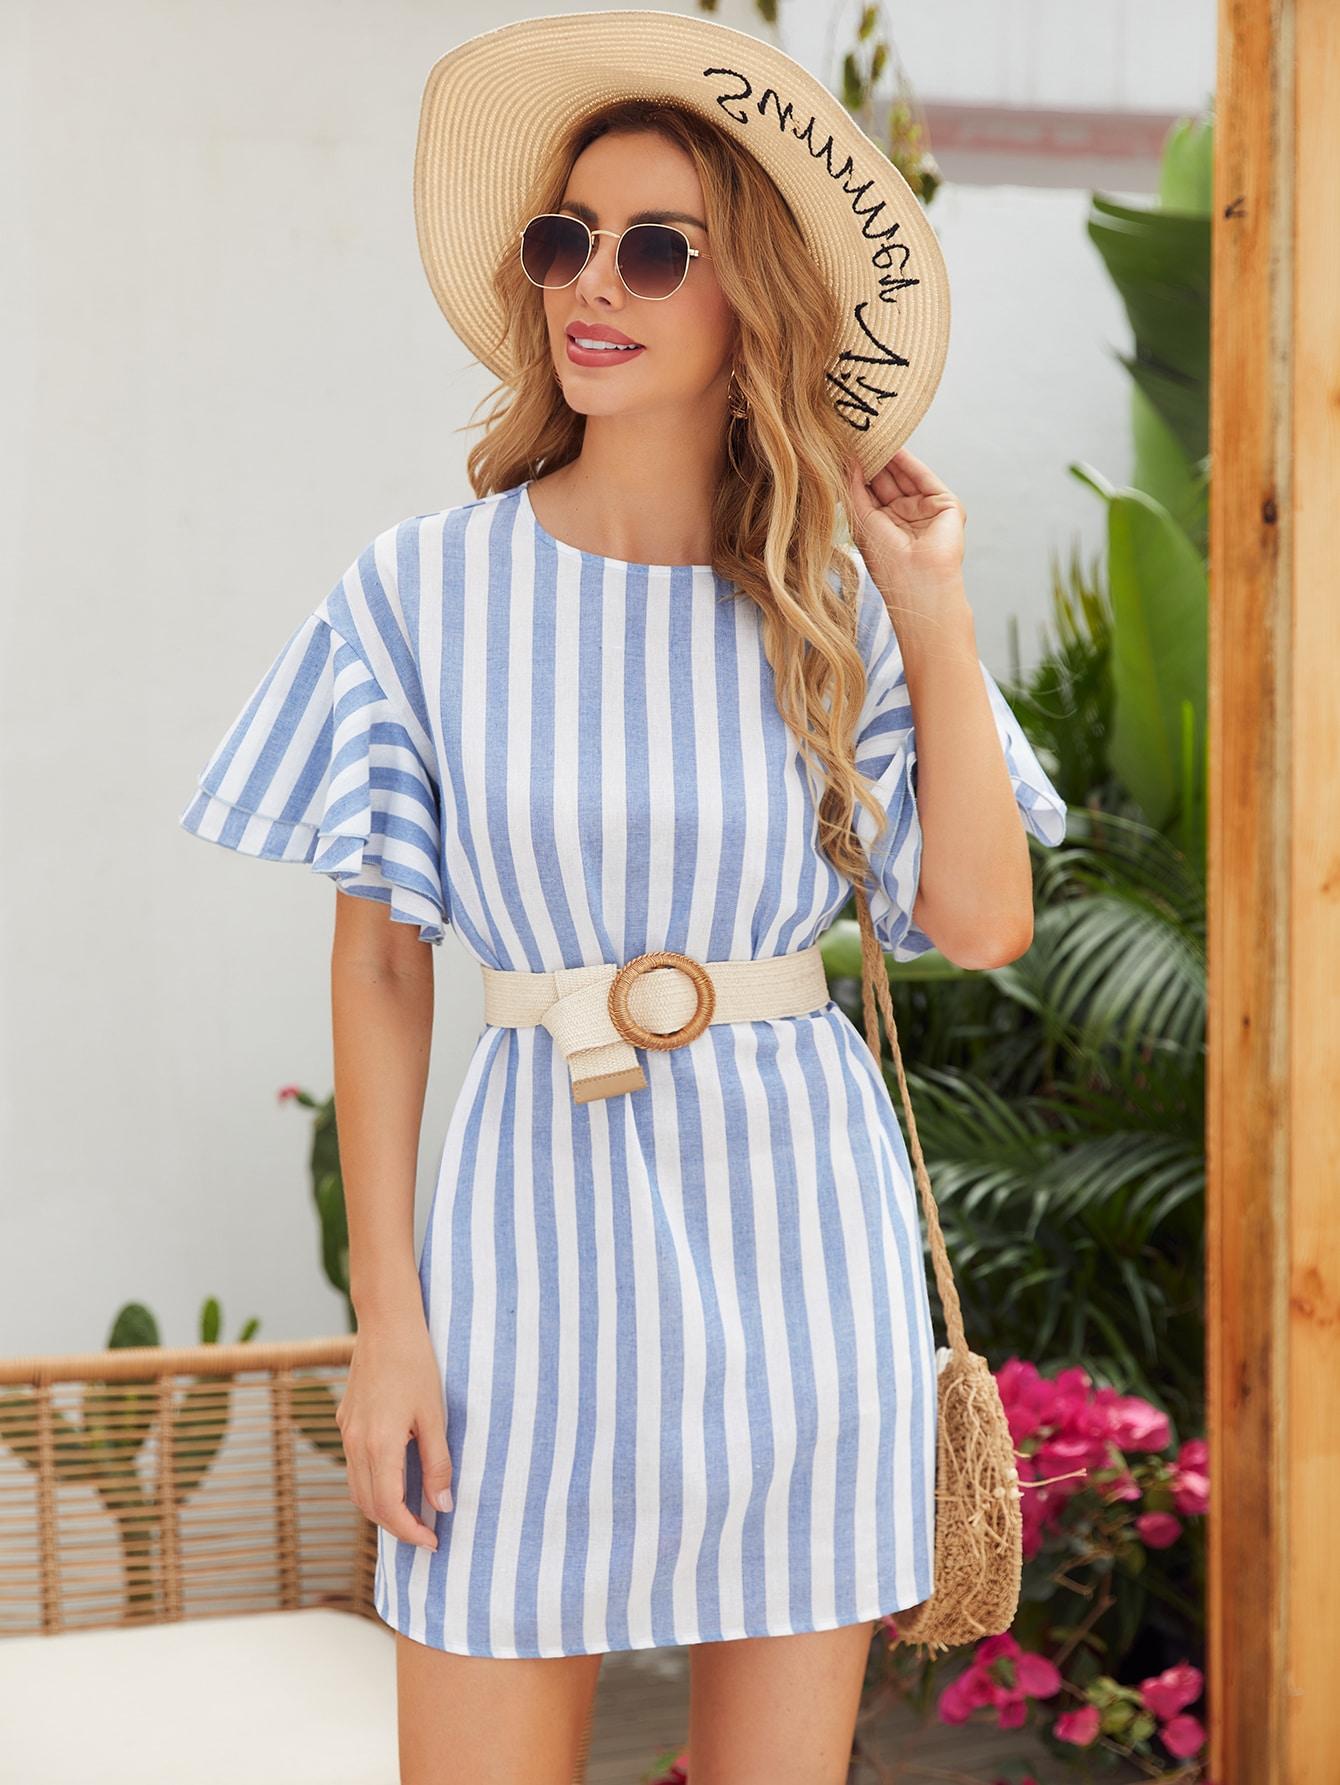 butterfly sleeve striped dress without belt